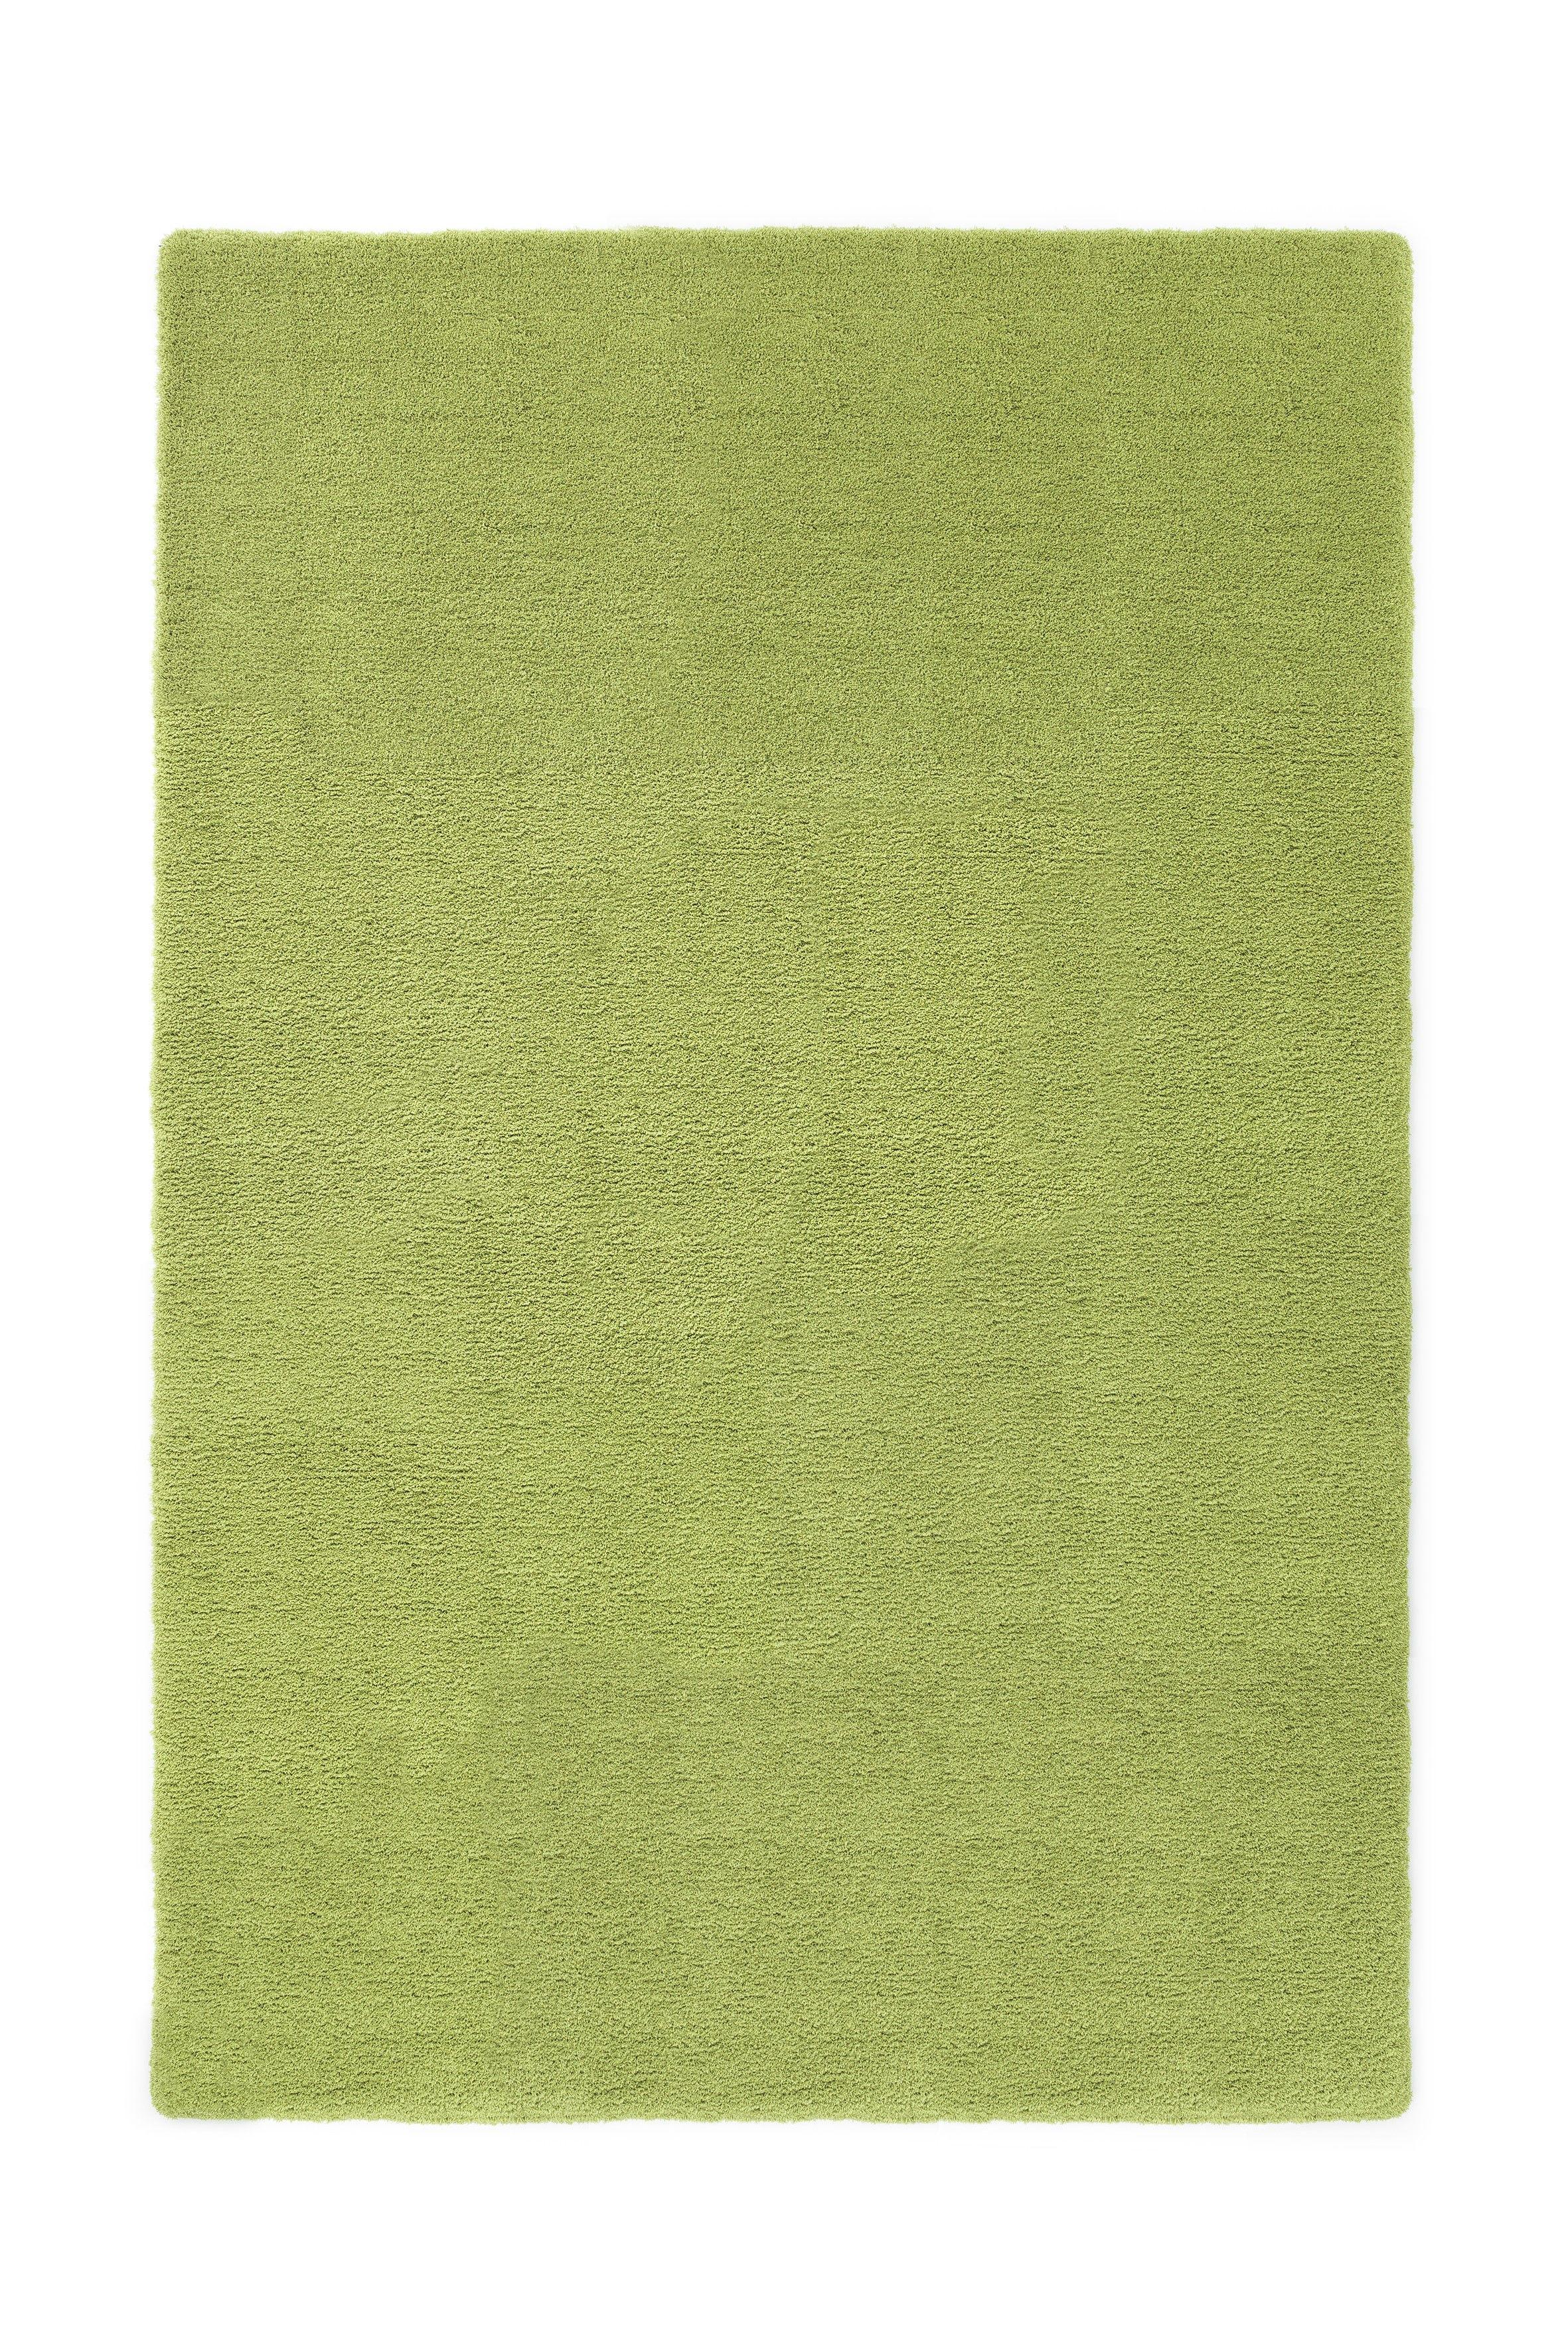 Astra - Golze koberce Kusový koberec Livorno 030 Green - 120x180 cm